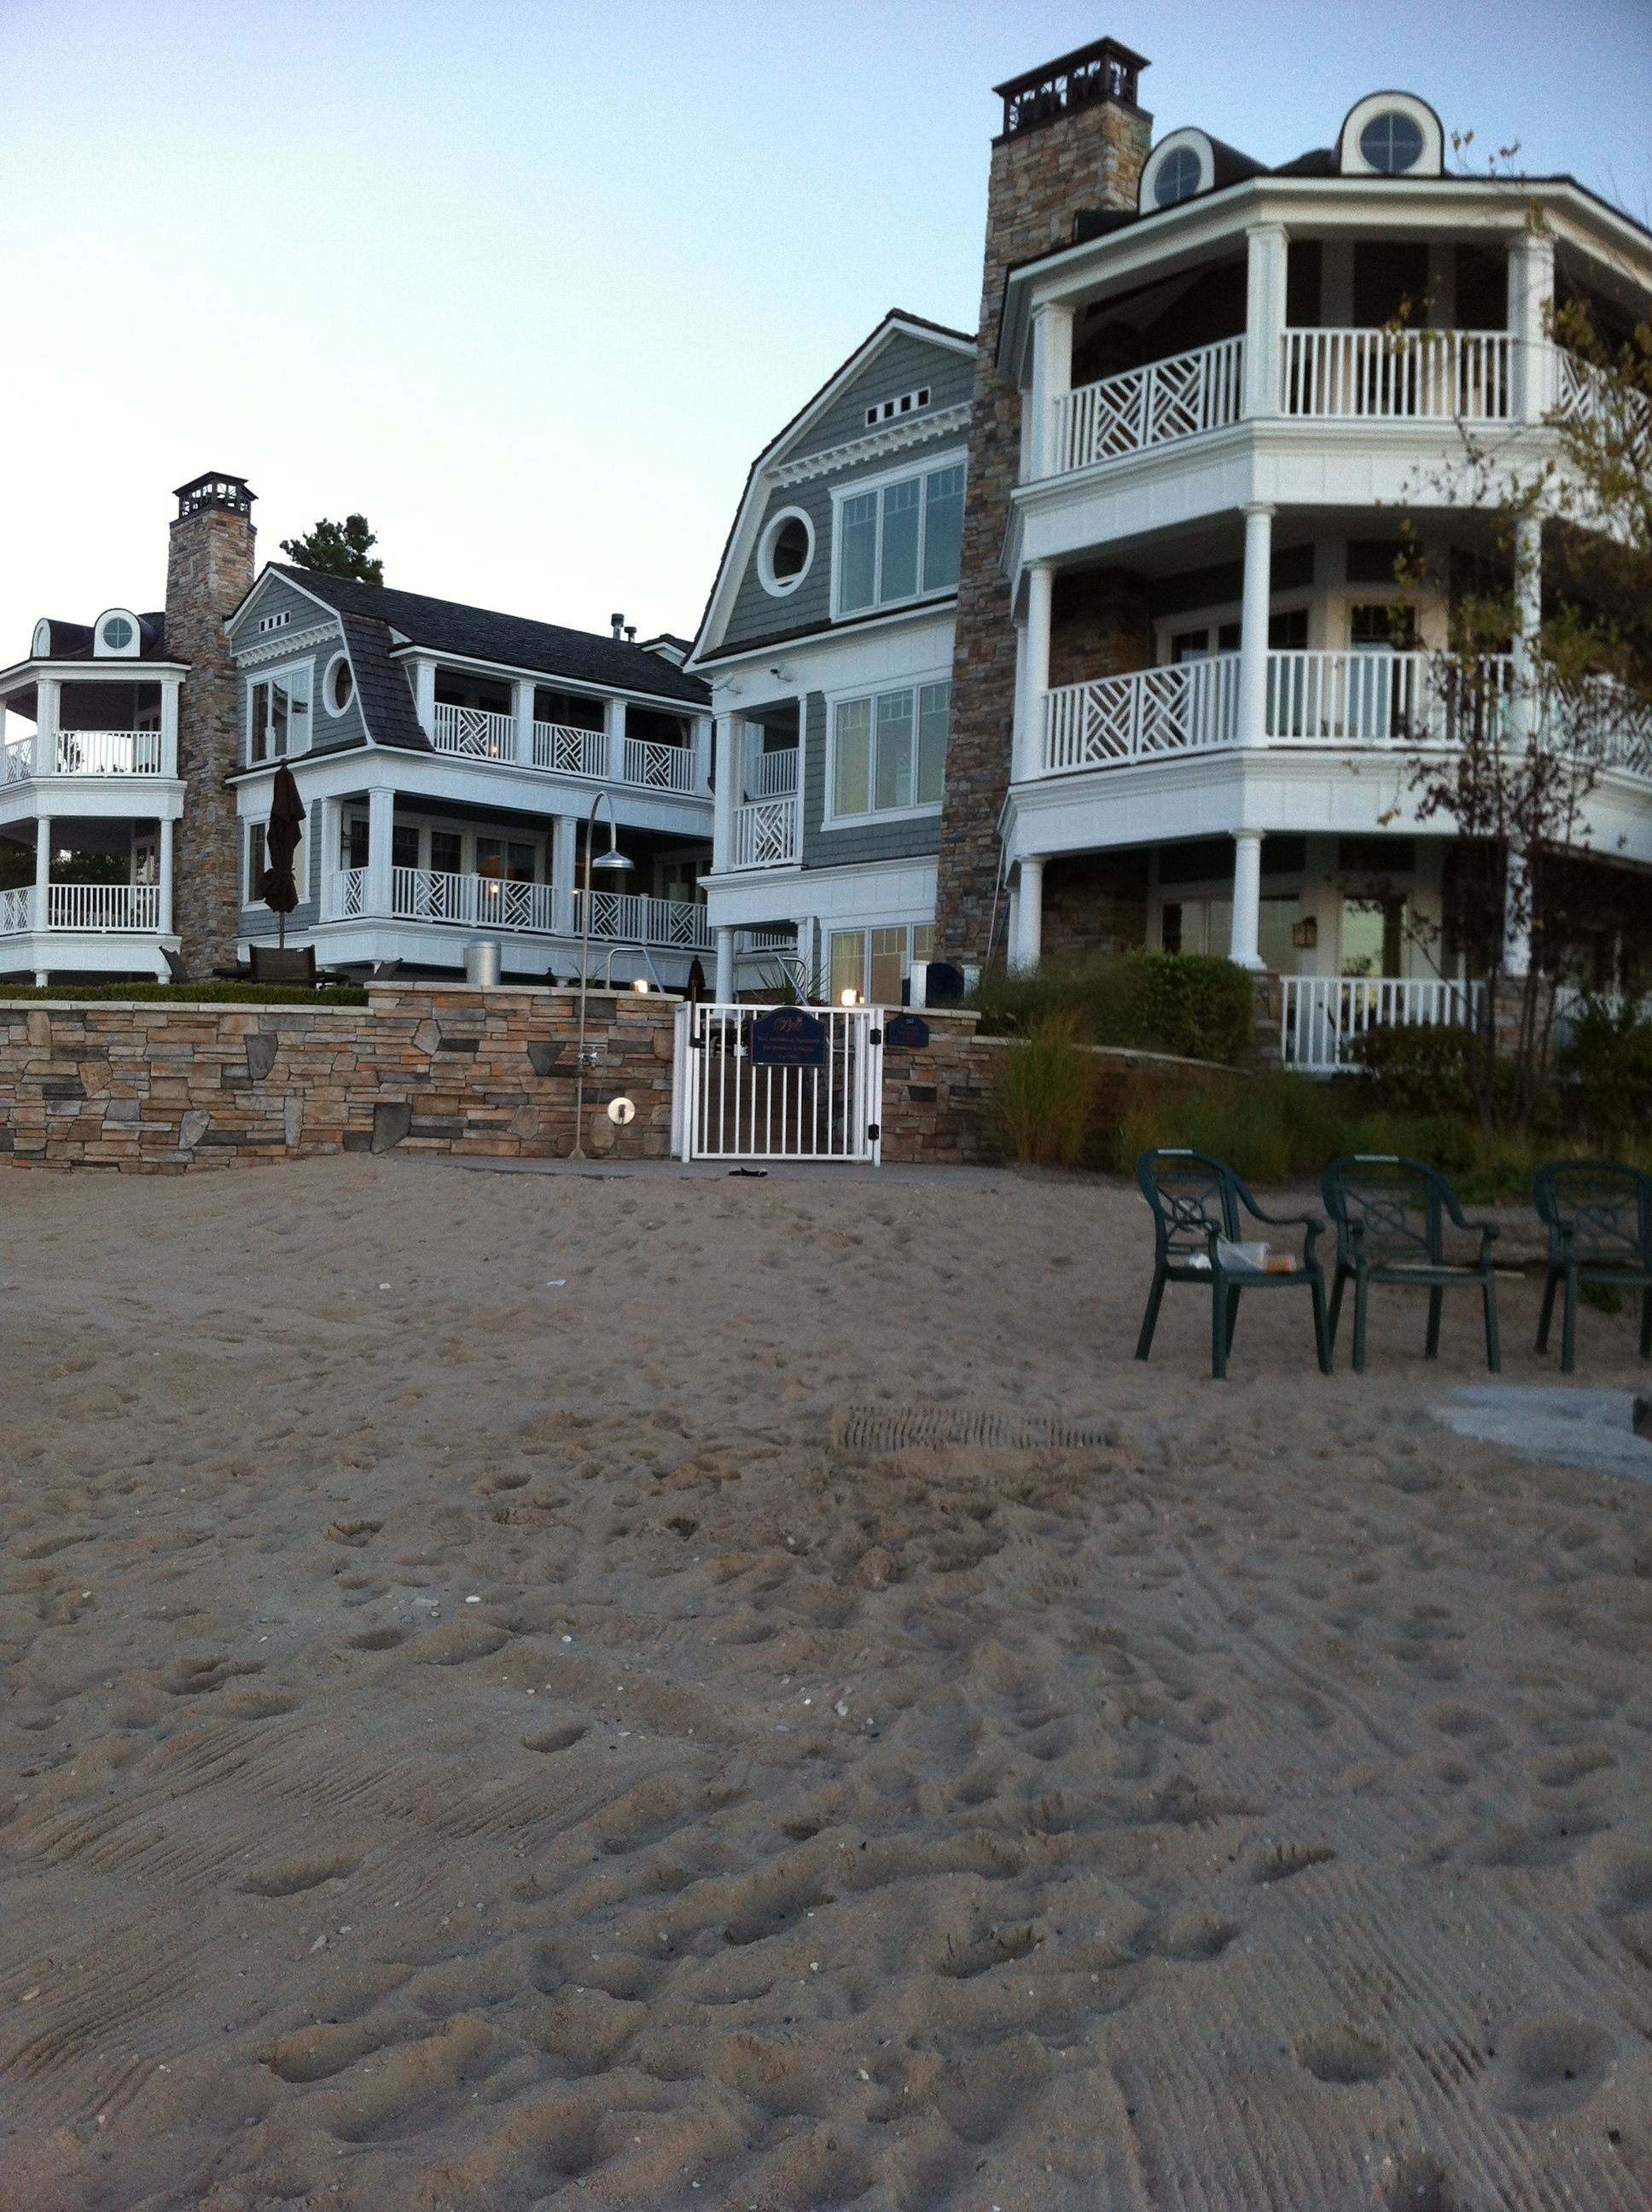 Our Hotel Le Bear Resort Vacation 09 30 12 In Glen Arbor Mi